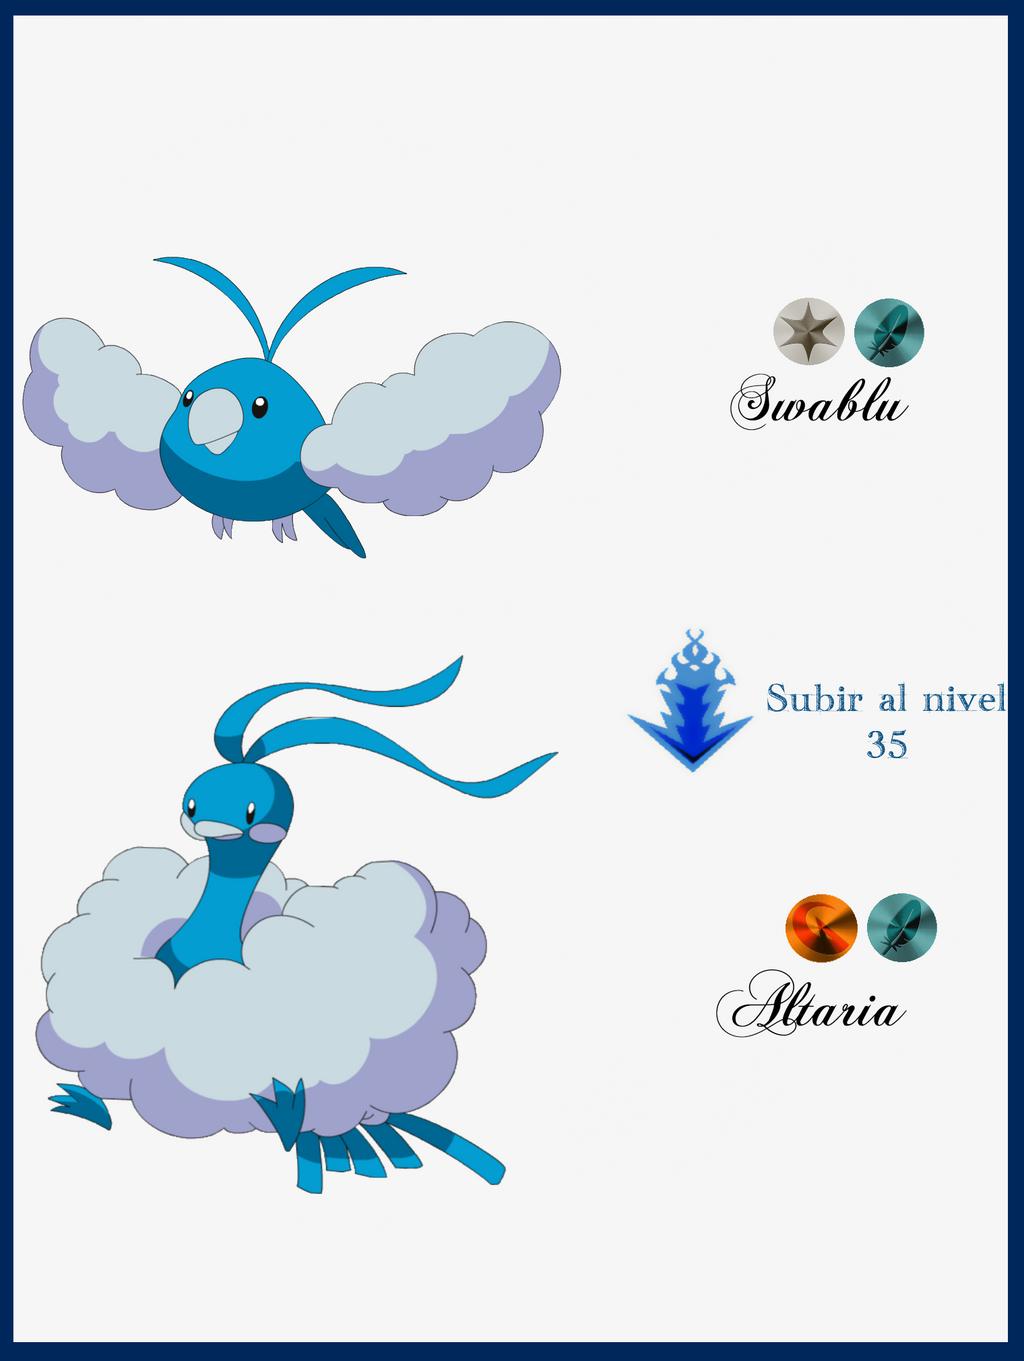 Pin Swablu Evolution Chart on Pinterest